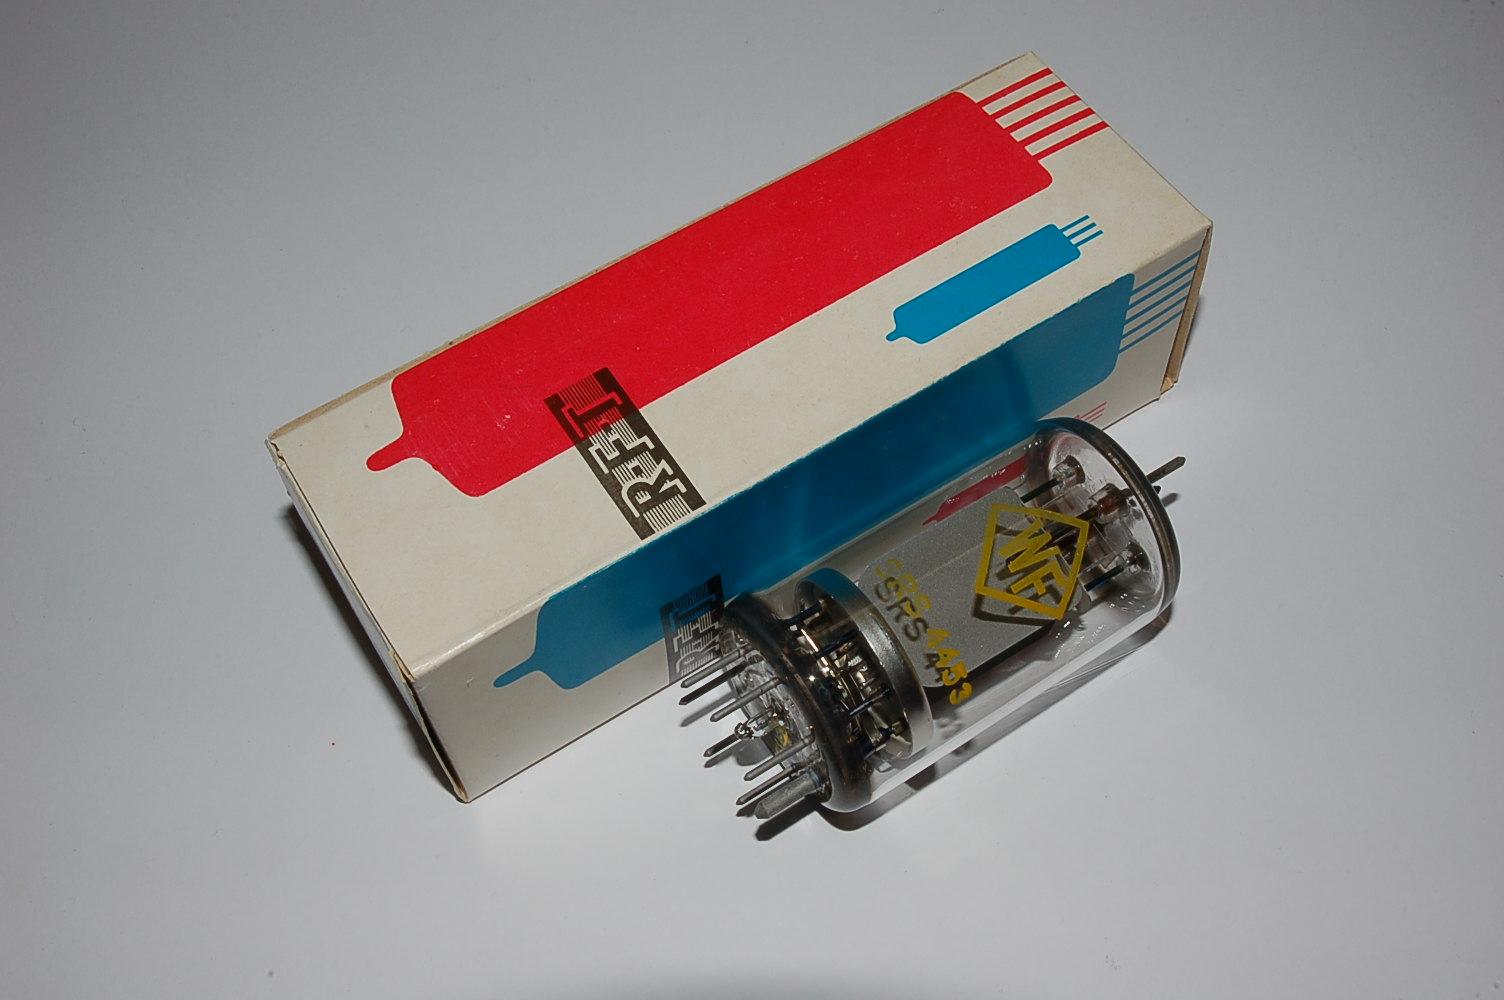 srs4453